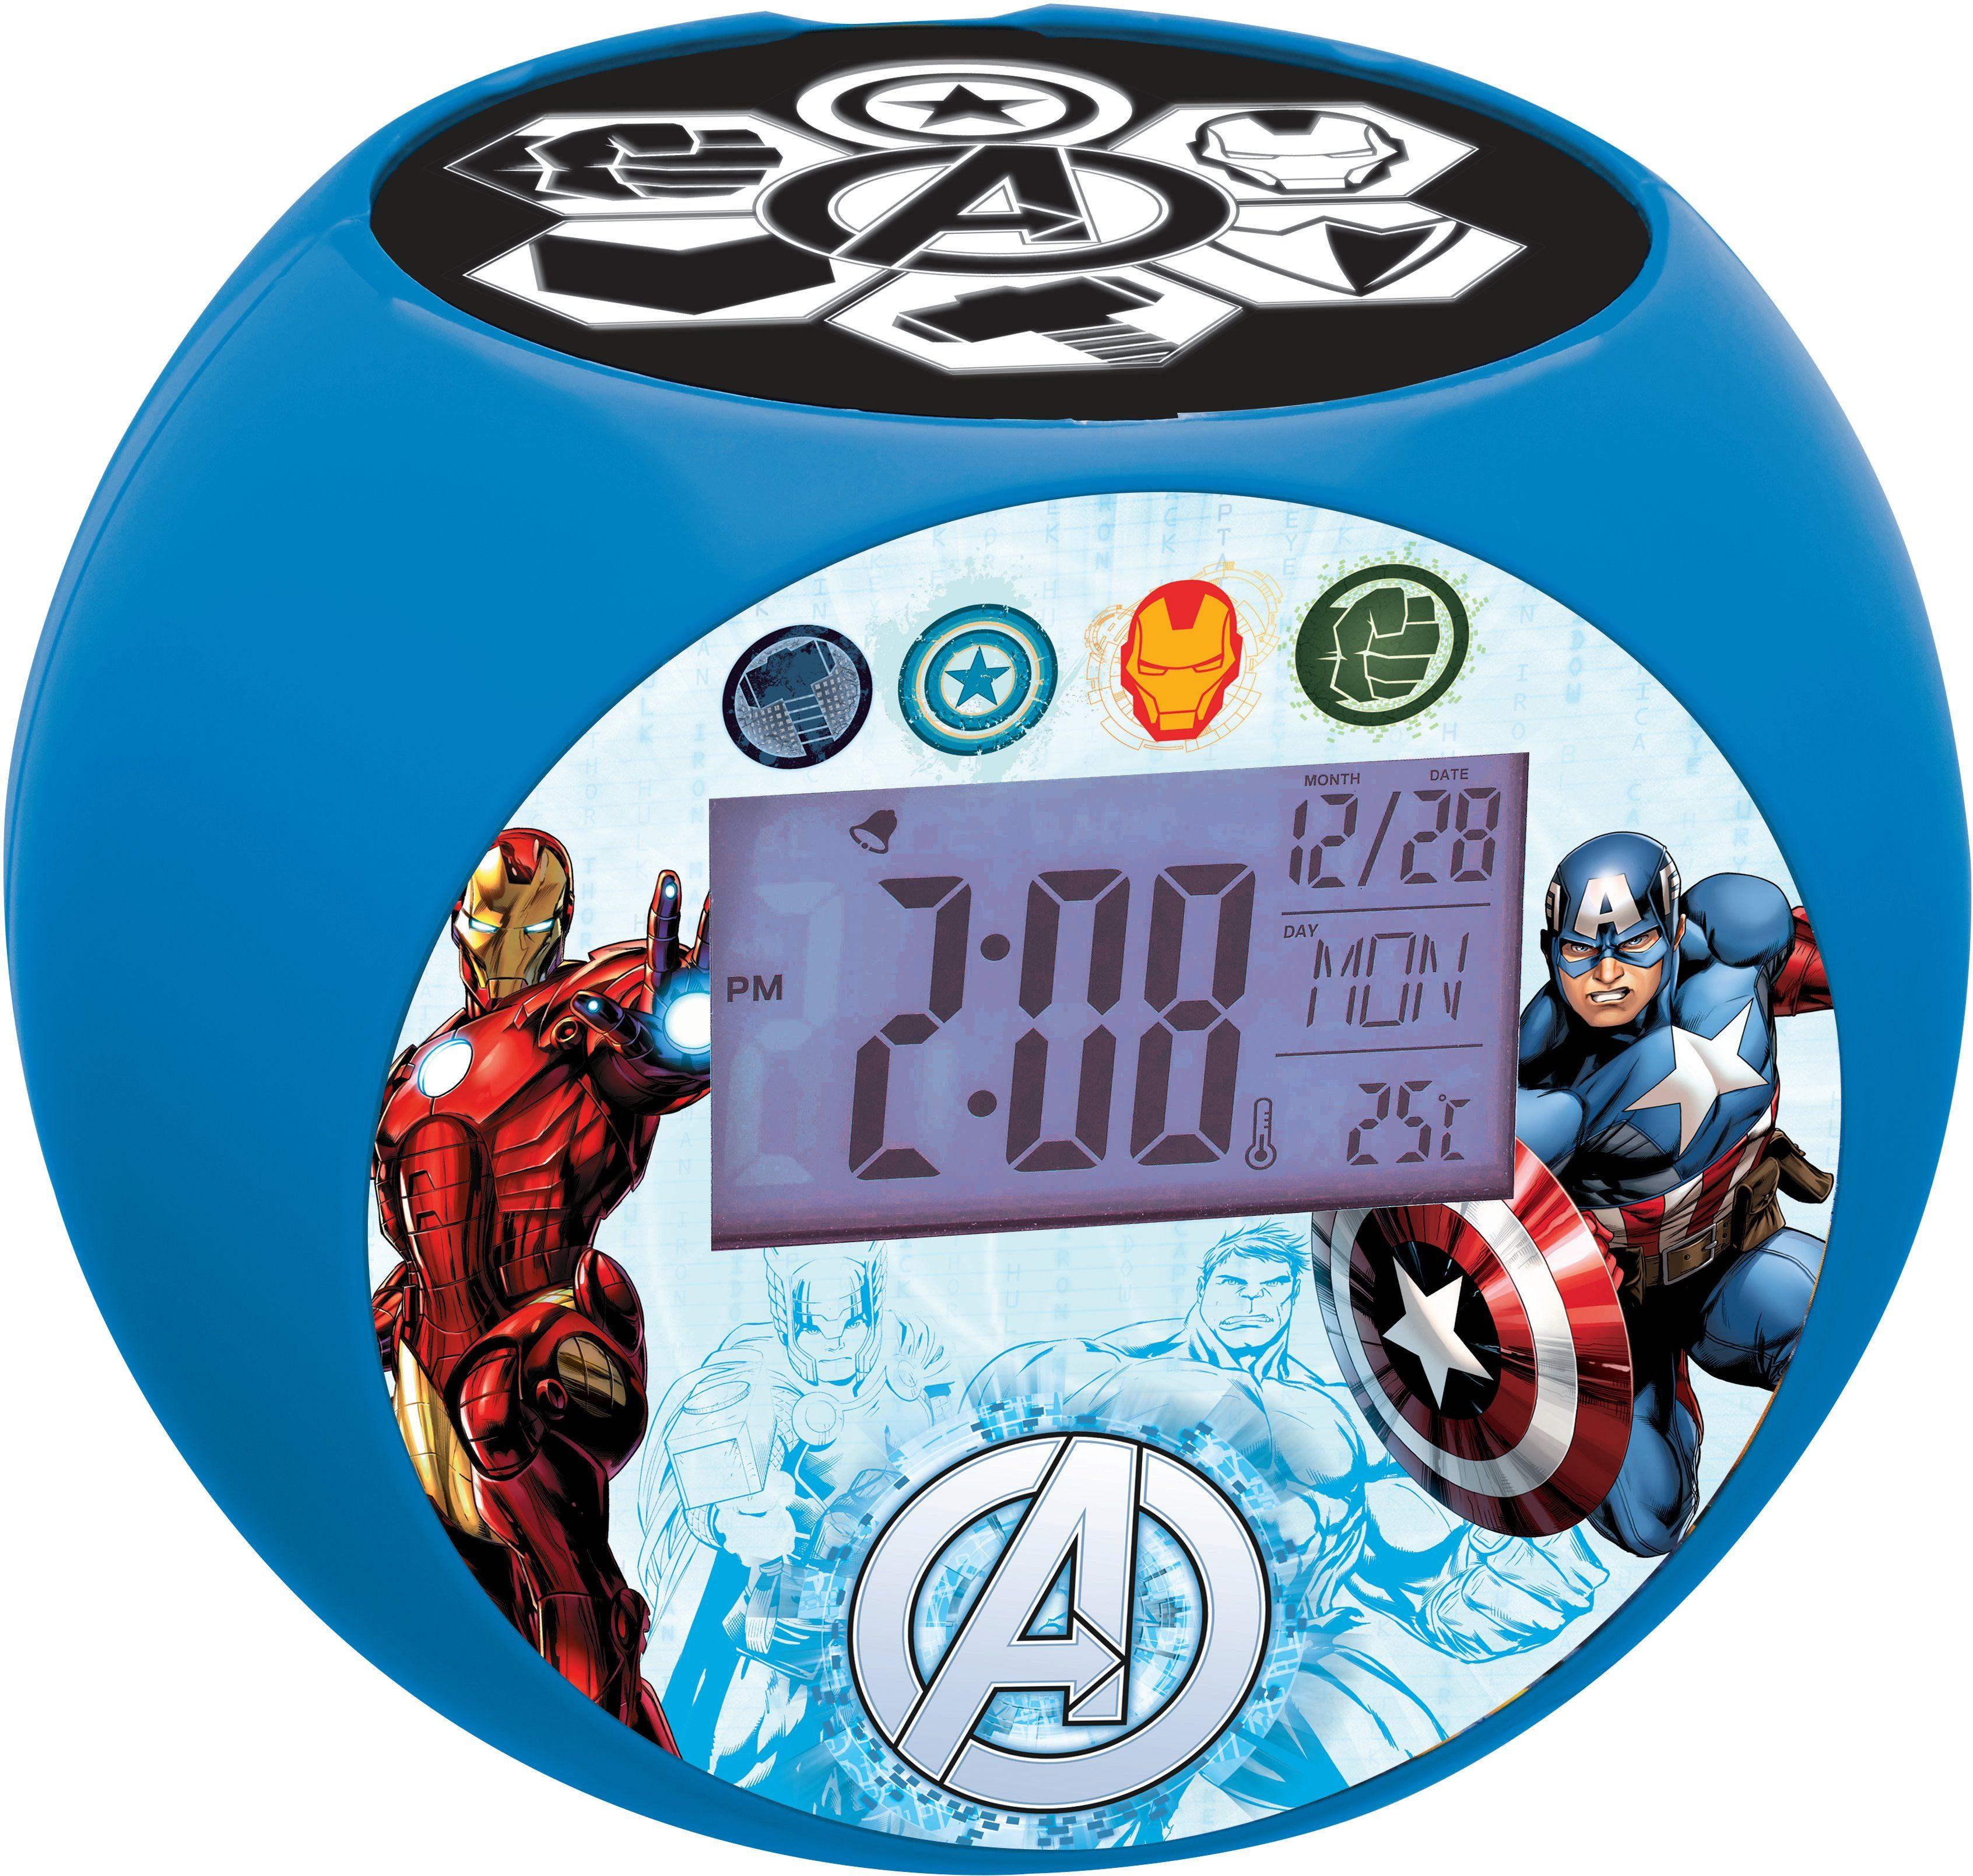 Lexibook, Projektionswecker, »Avengers«